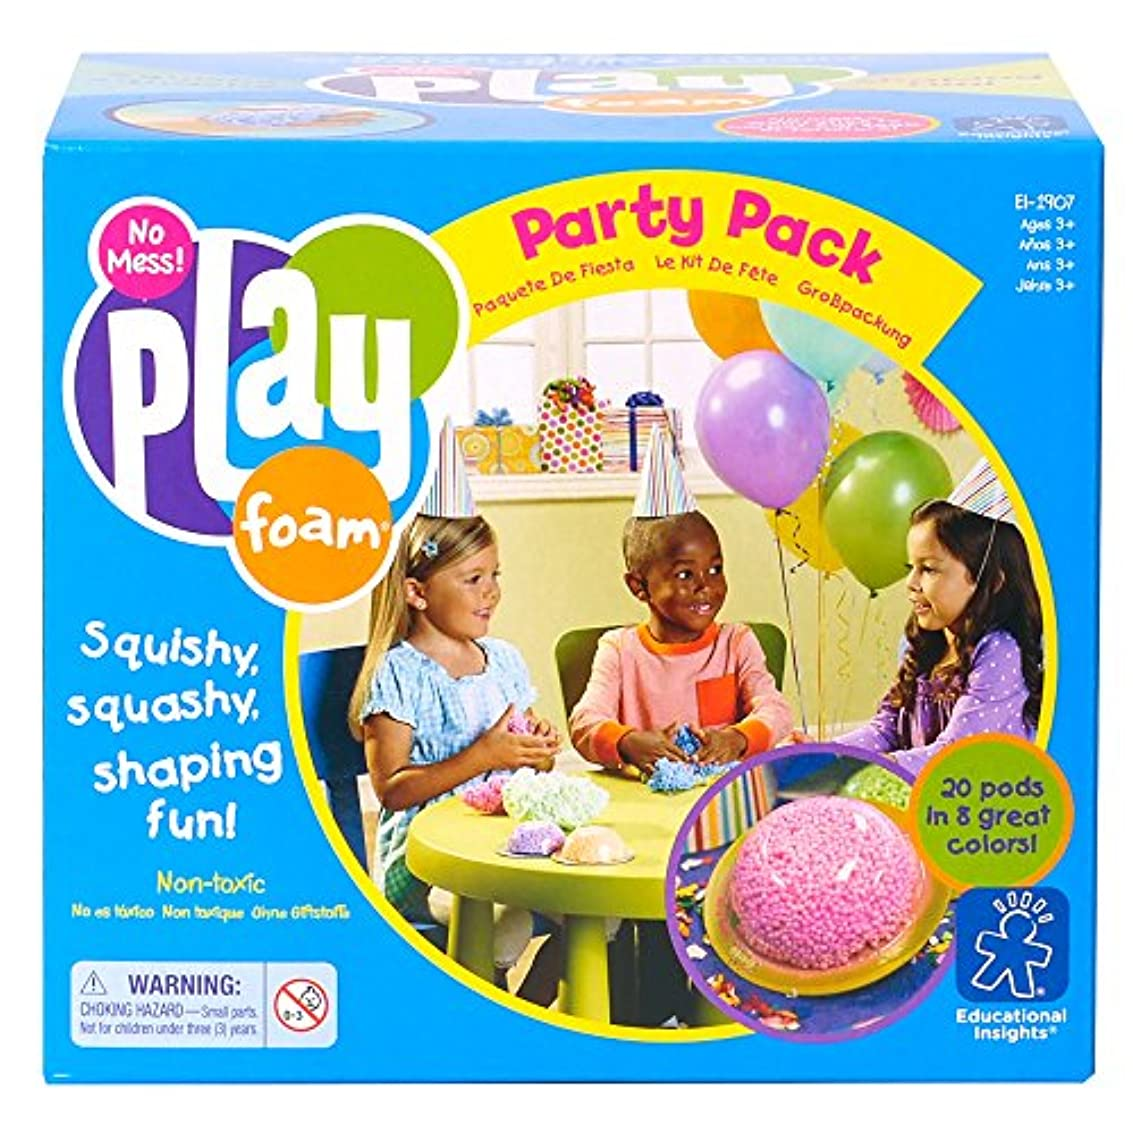 Playfoam Party Pack (20 Pods)  ねんど遊び プレイフォーム パーティパック(20個入り)  知育玩具